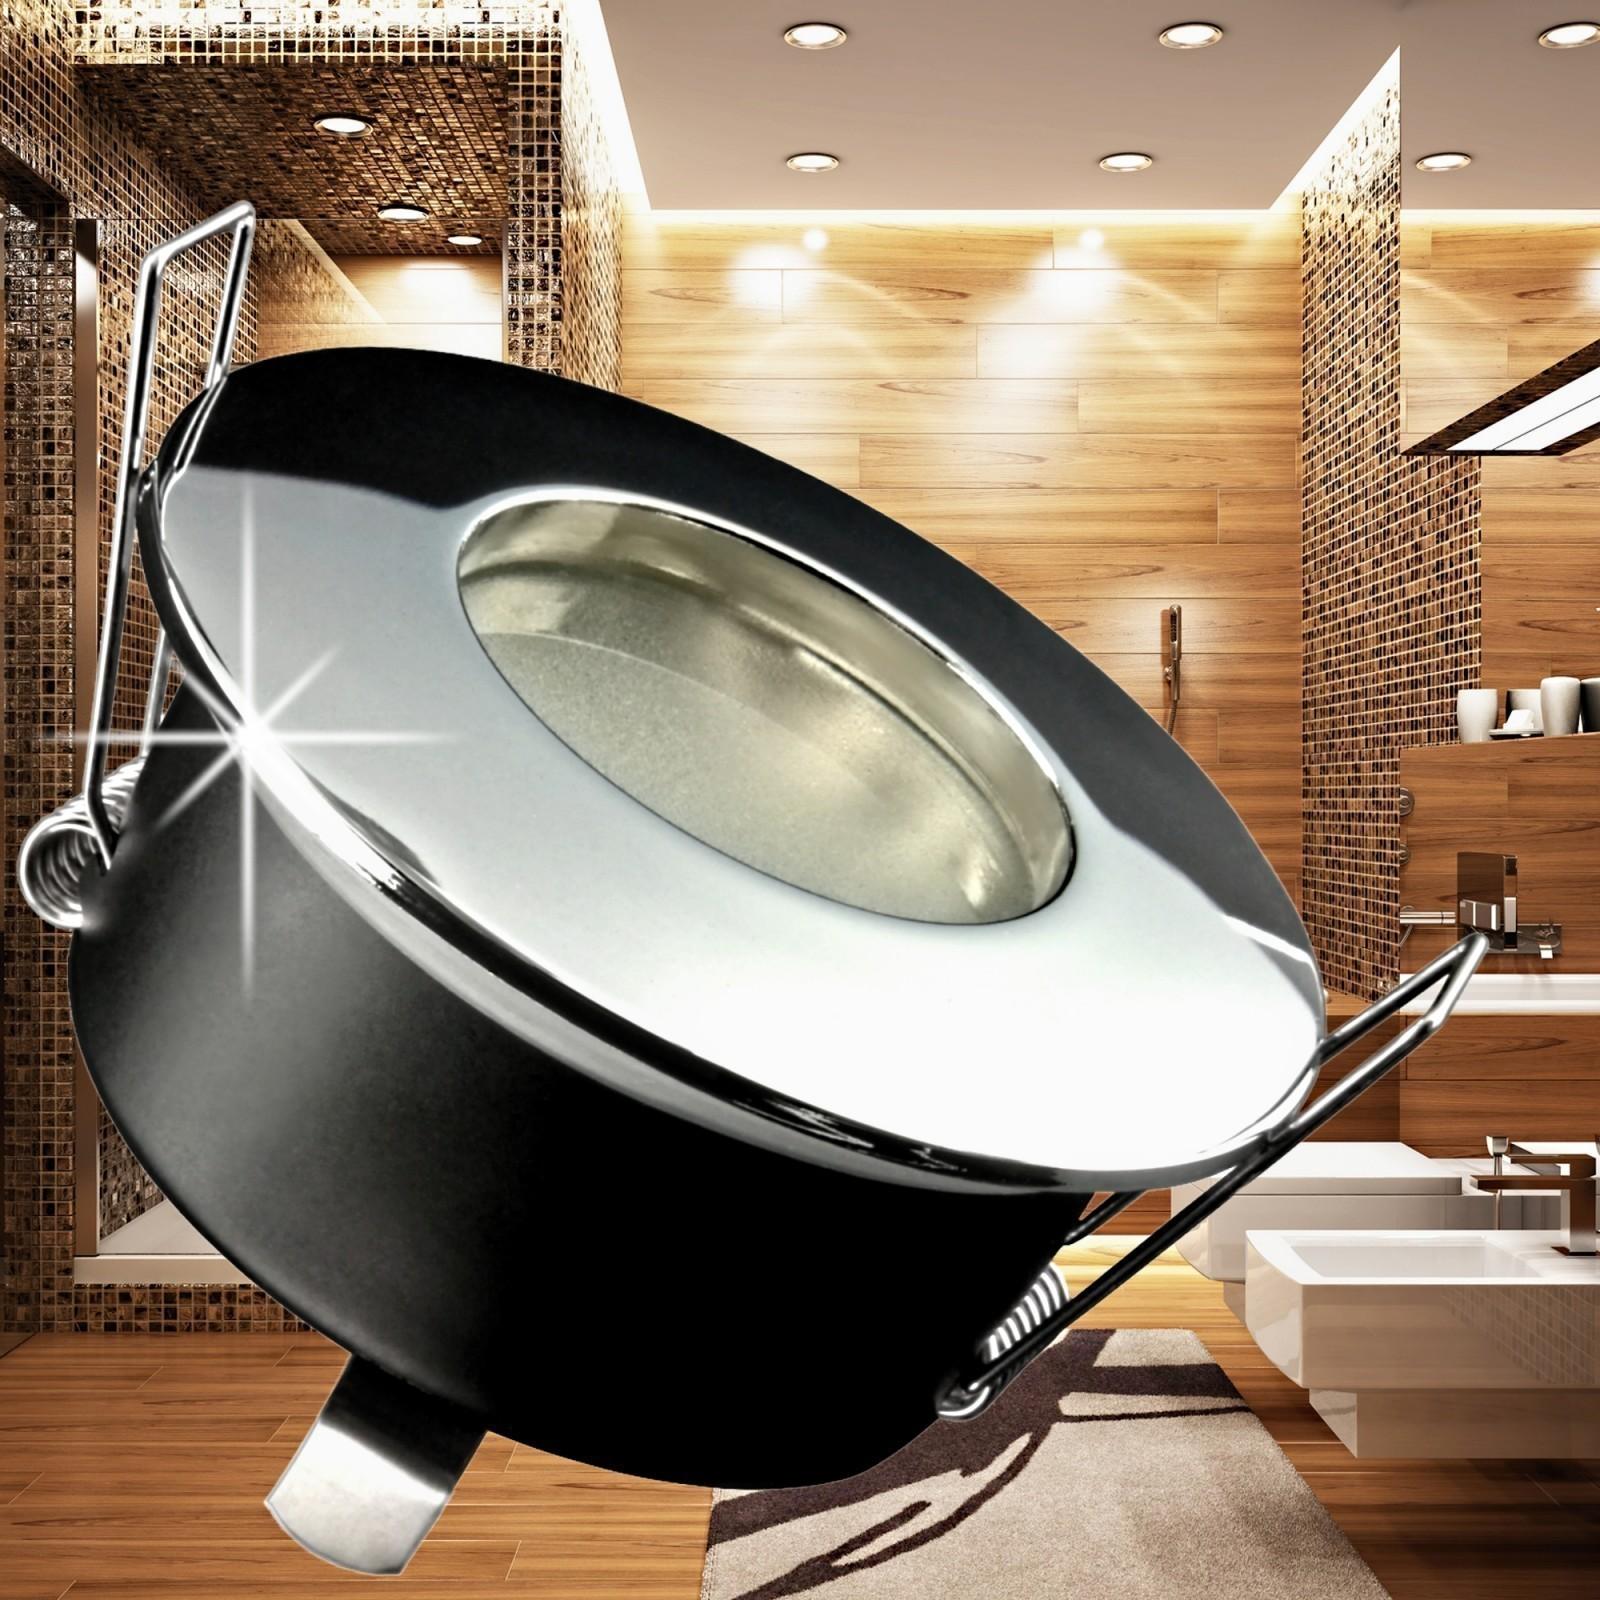 rw 1 led einbaustrahler bad ip65 in rund chrom inkl 5w led gu10 neutralwei 230v. Black Bedroom Furniture Sets. Home Design Ideas